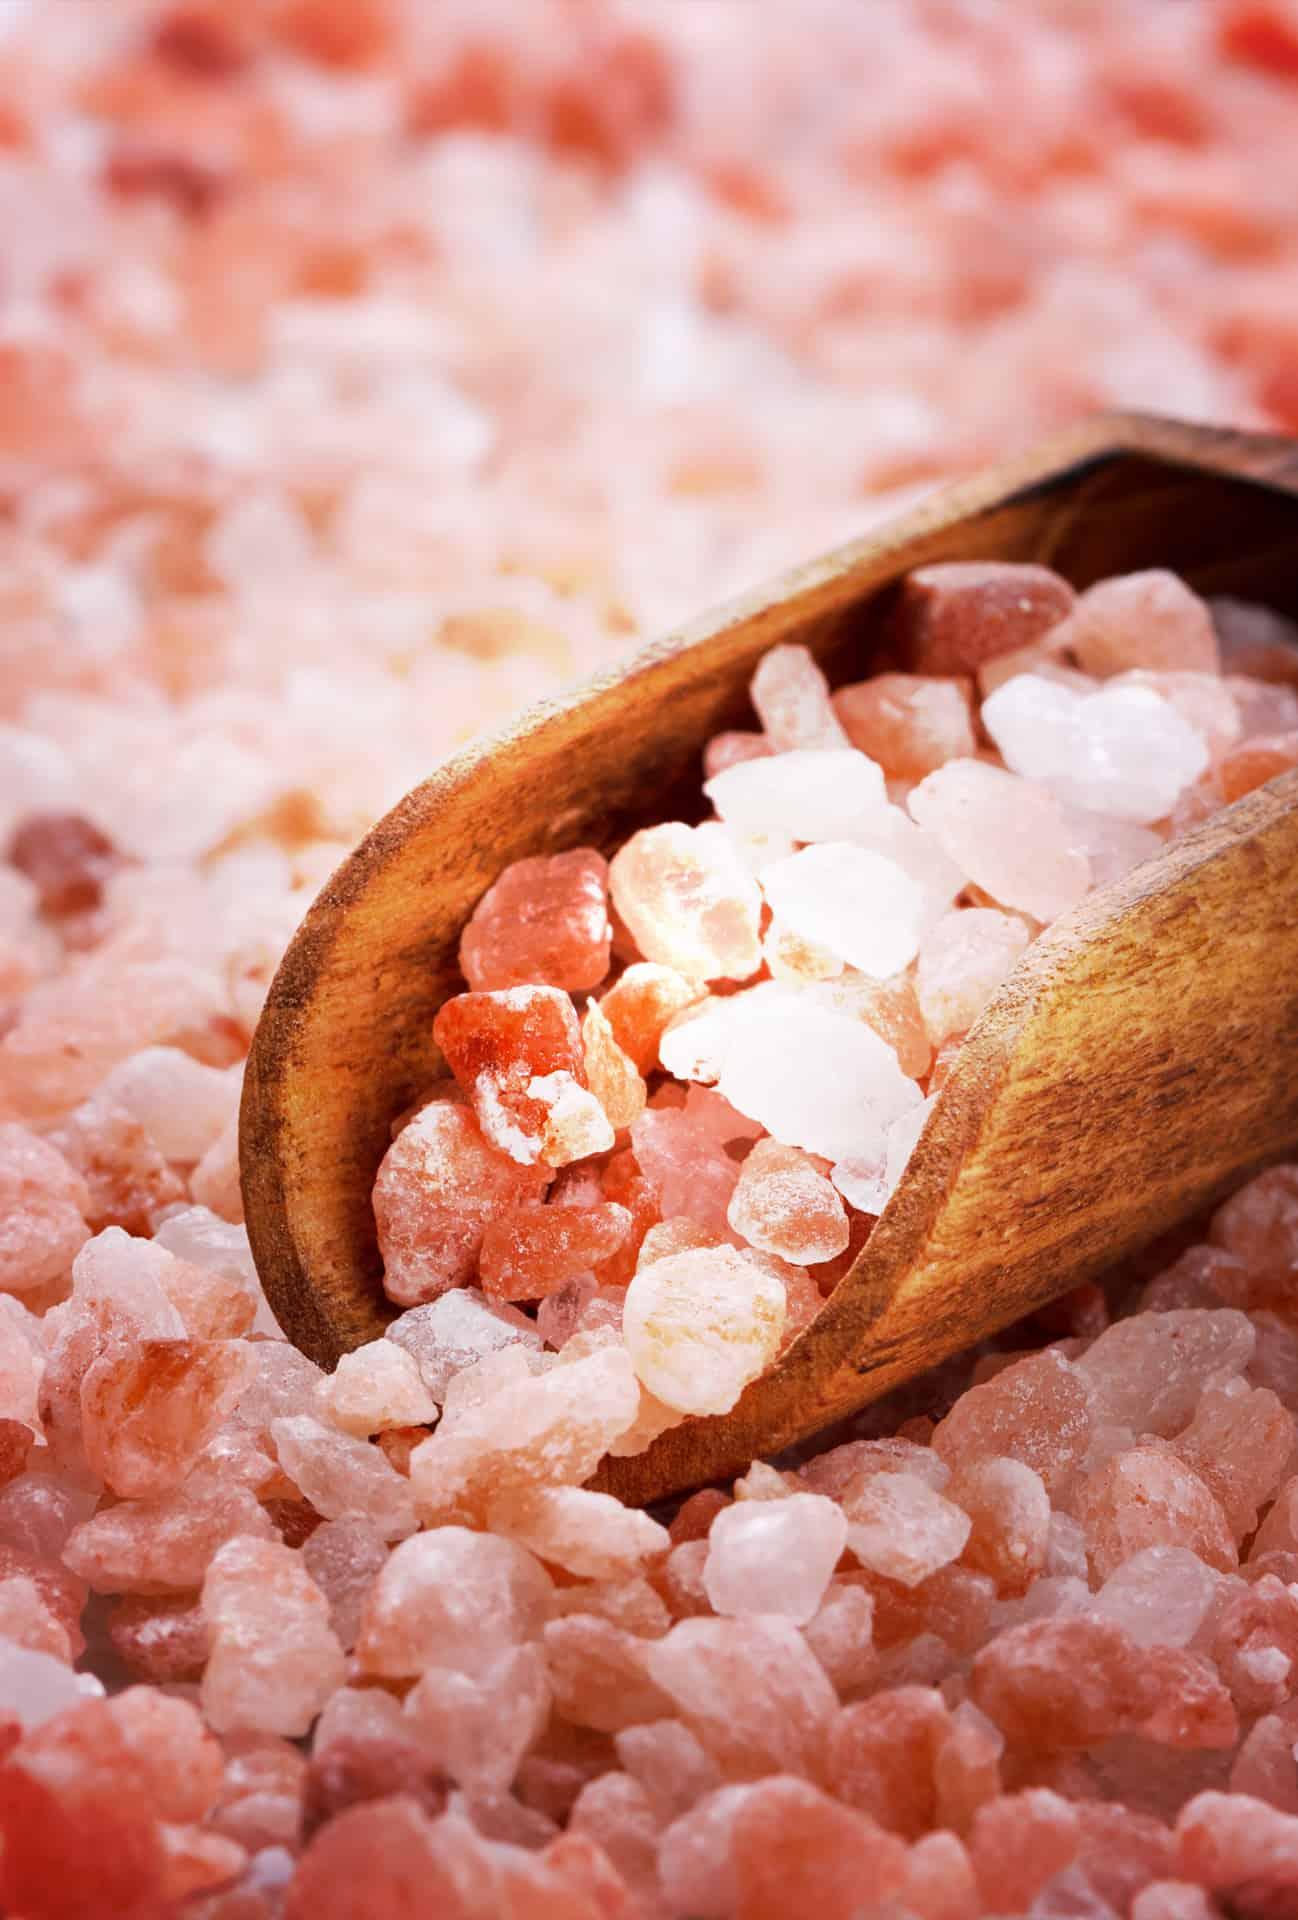 Pink Salt, Pink Himalayan Salt, Pink Himalayan Sea Salt, Himalayan Pink Salt, Himalayan Salt, Benefits of Himalayan Salt, Himalayan pink salt benefits